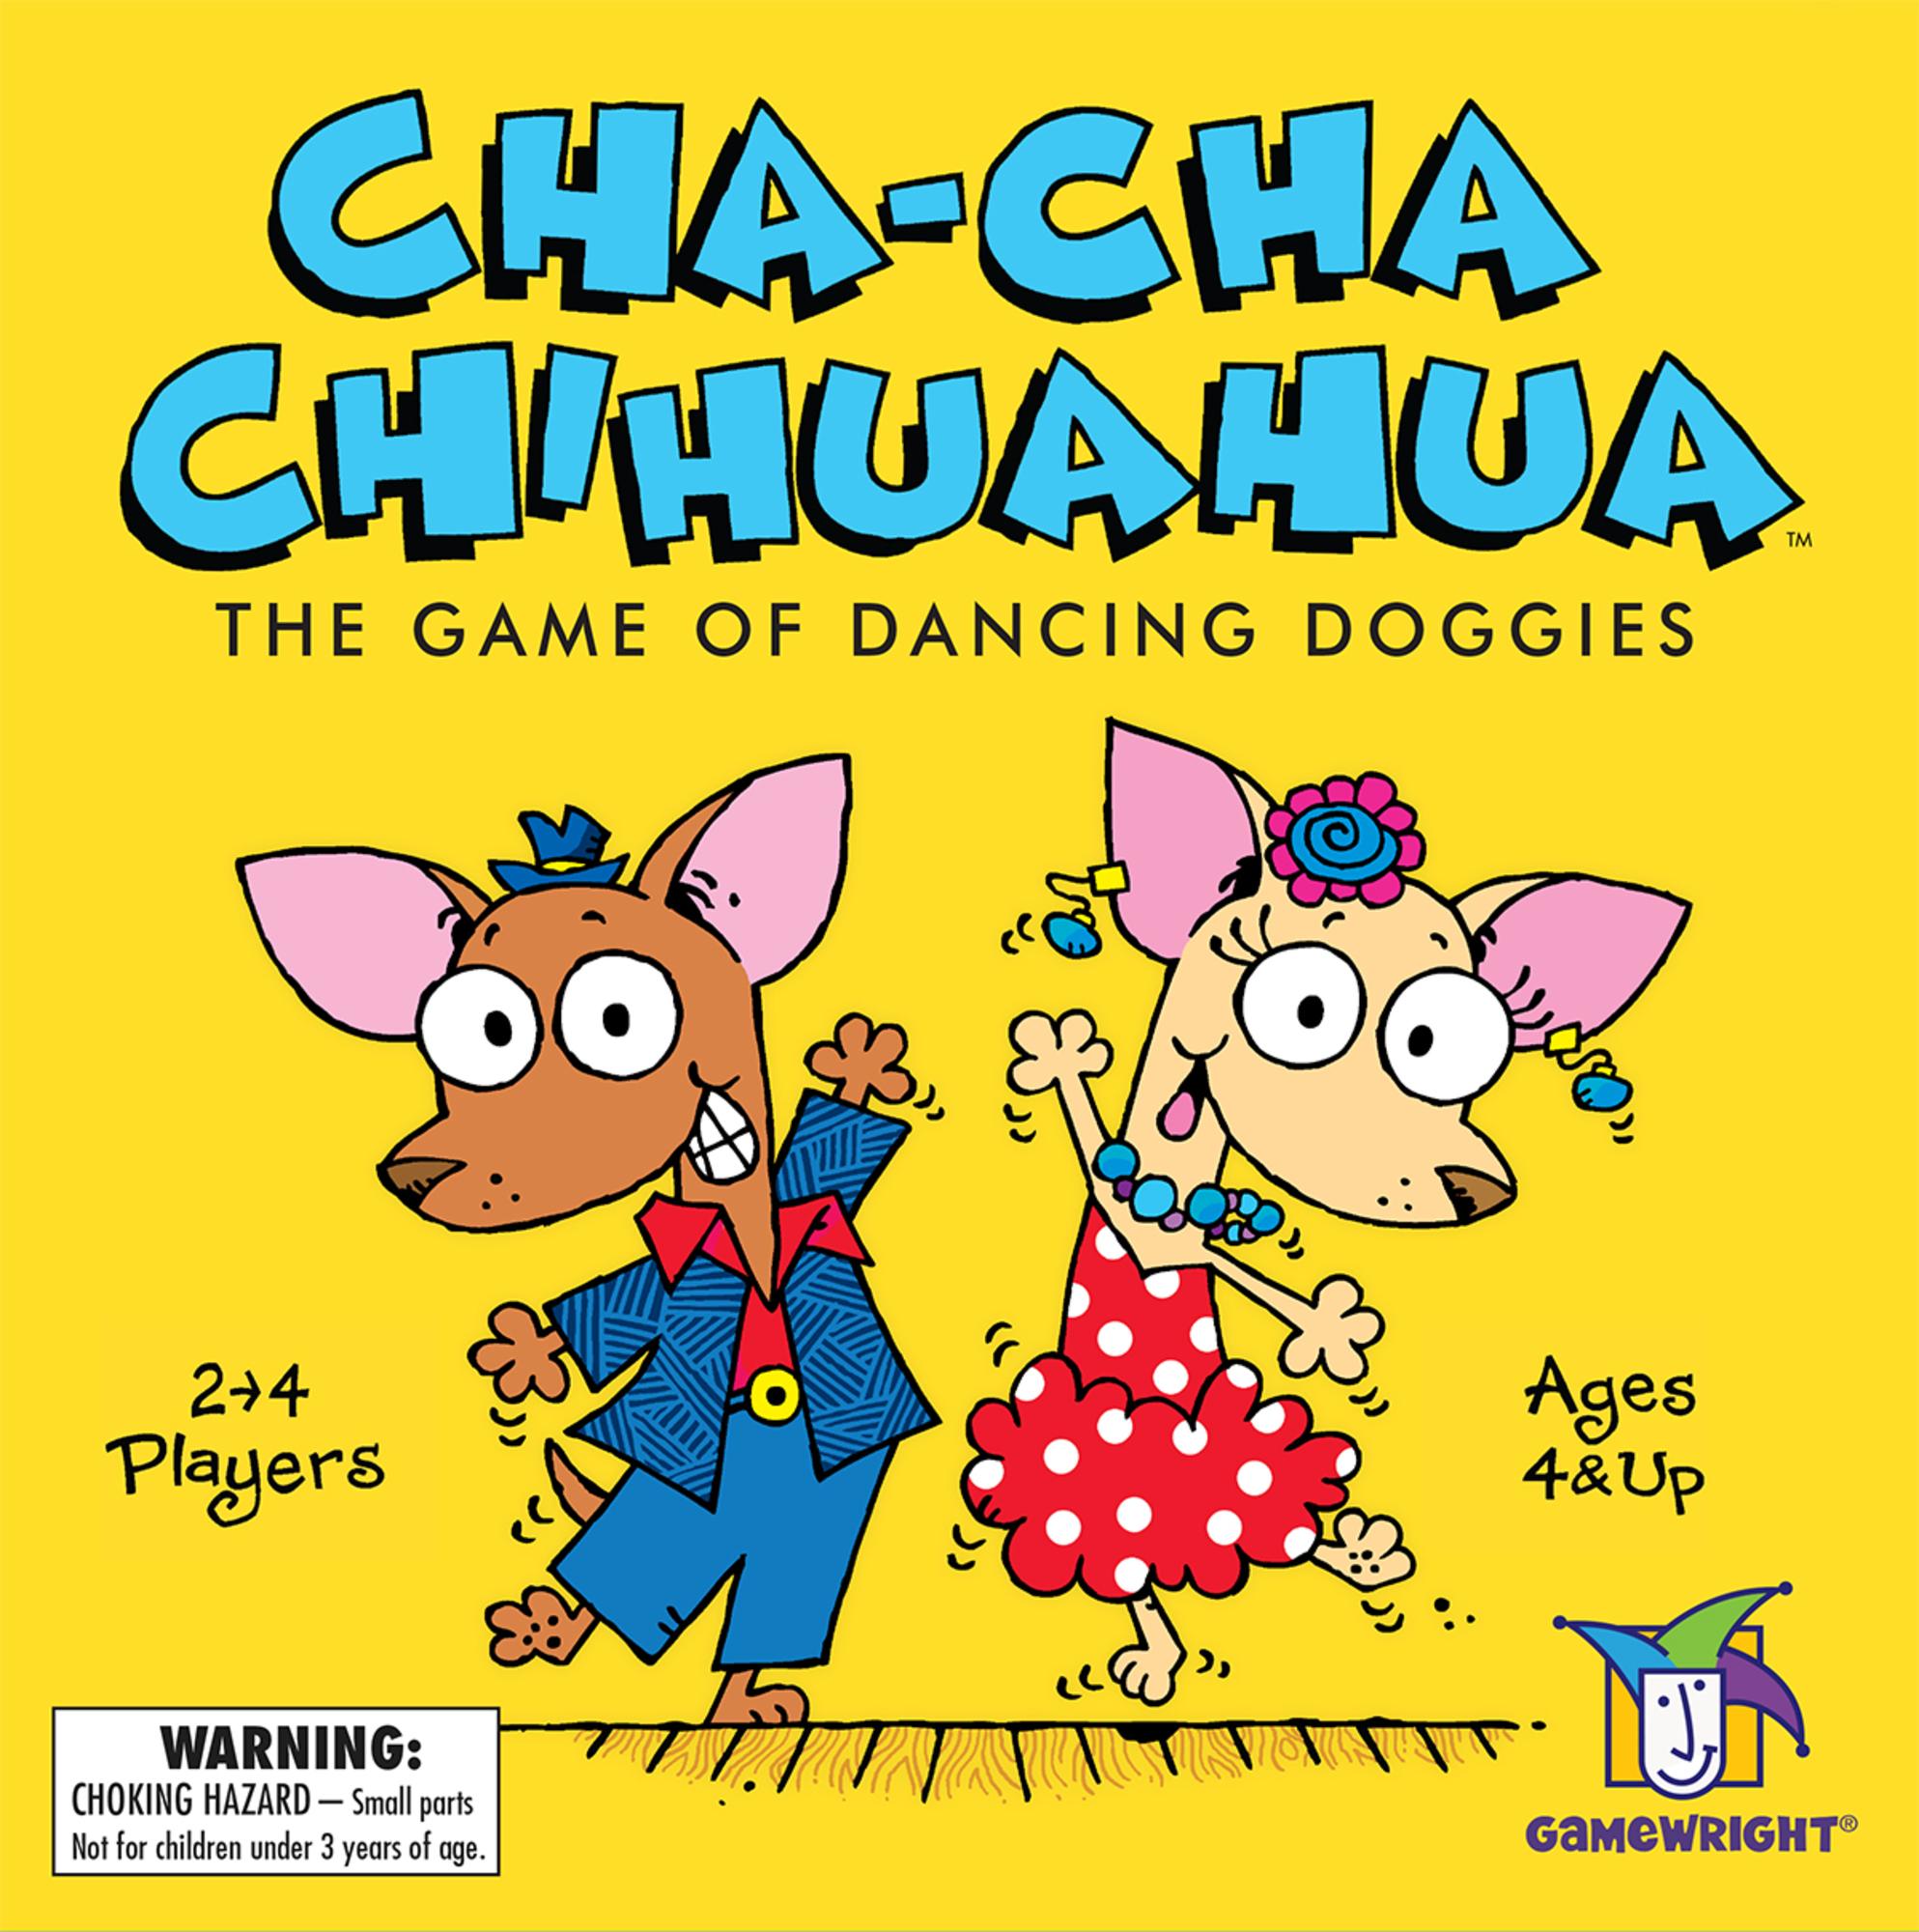 ChaCha ChihuahuaTM